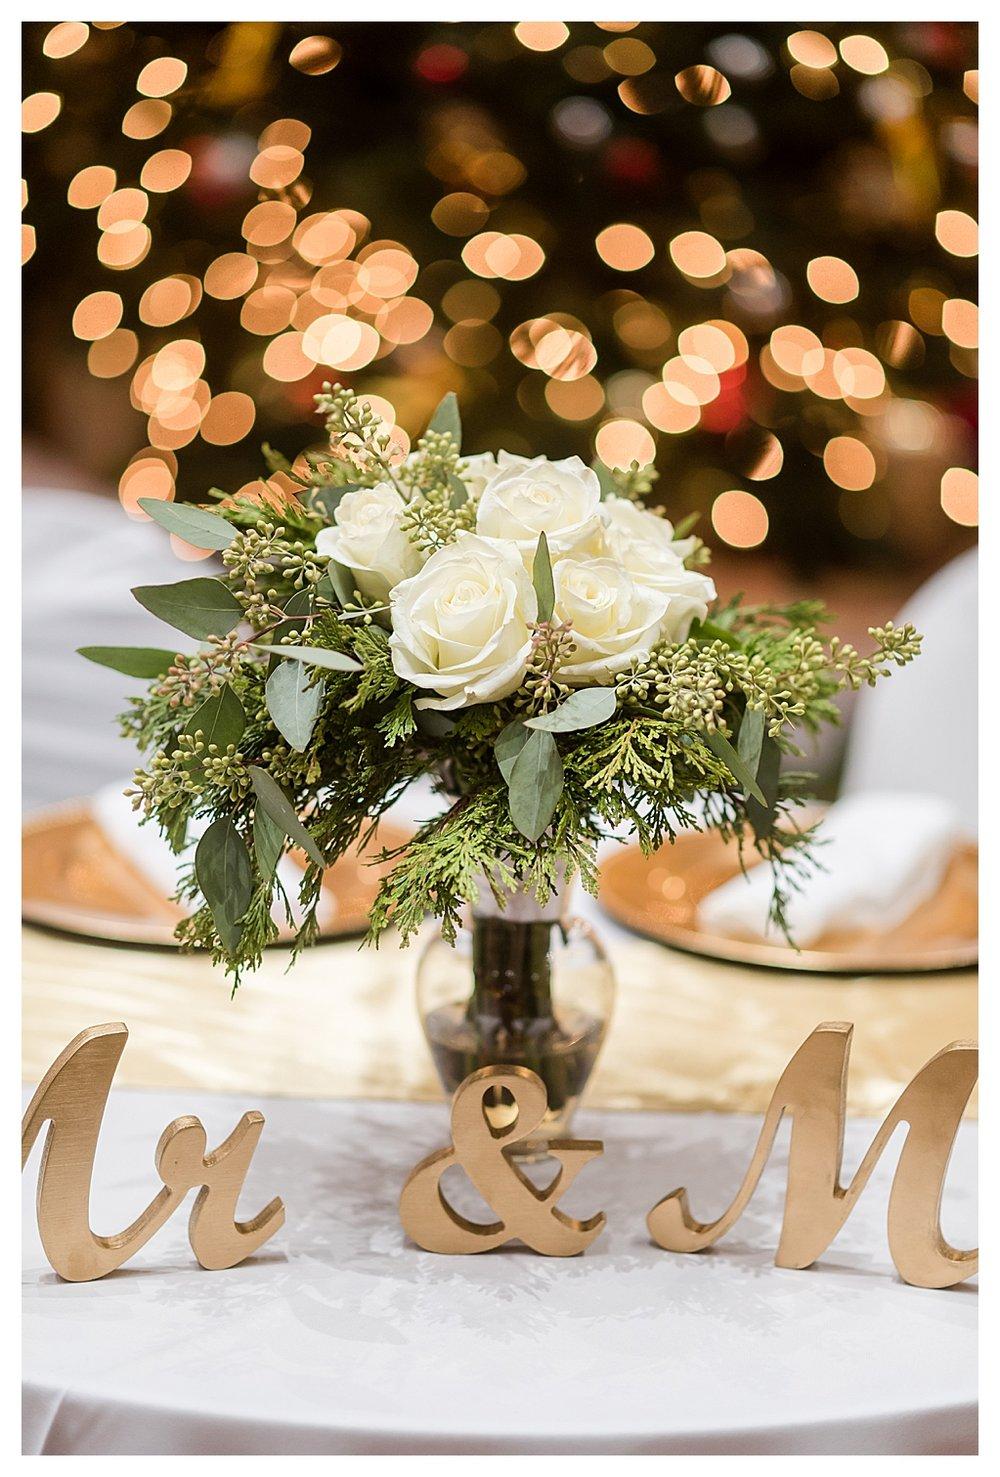 Christmas Themed Winter Wedding at Plum Creek Golf Club_0880.jpg